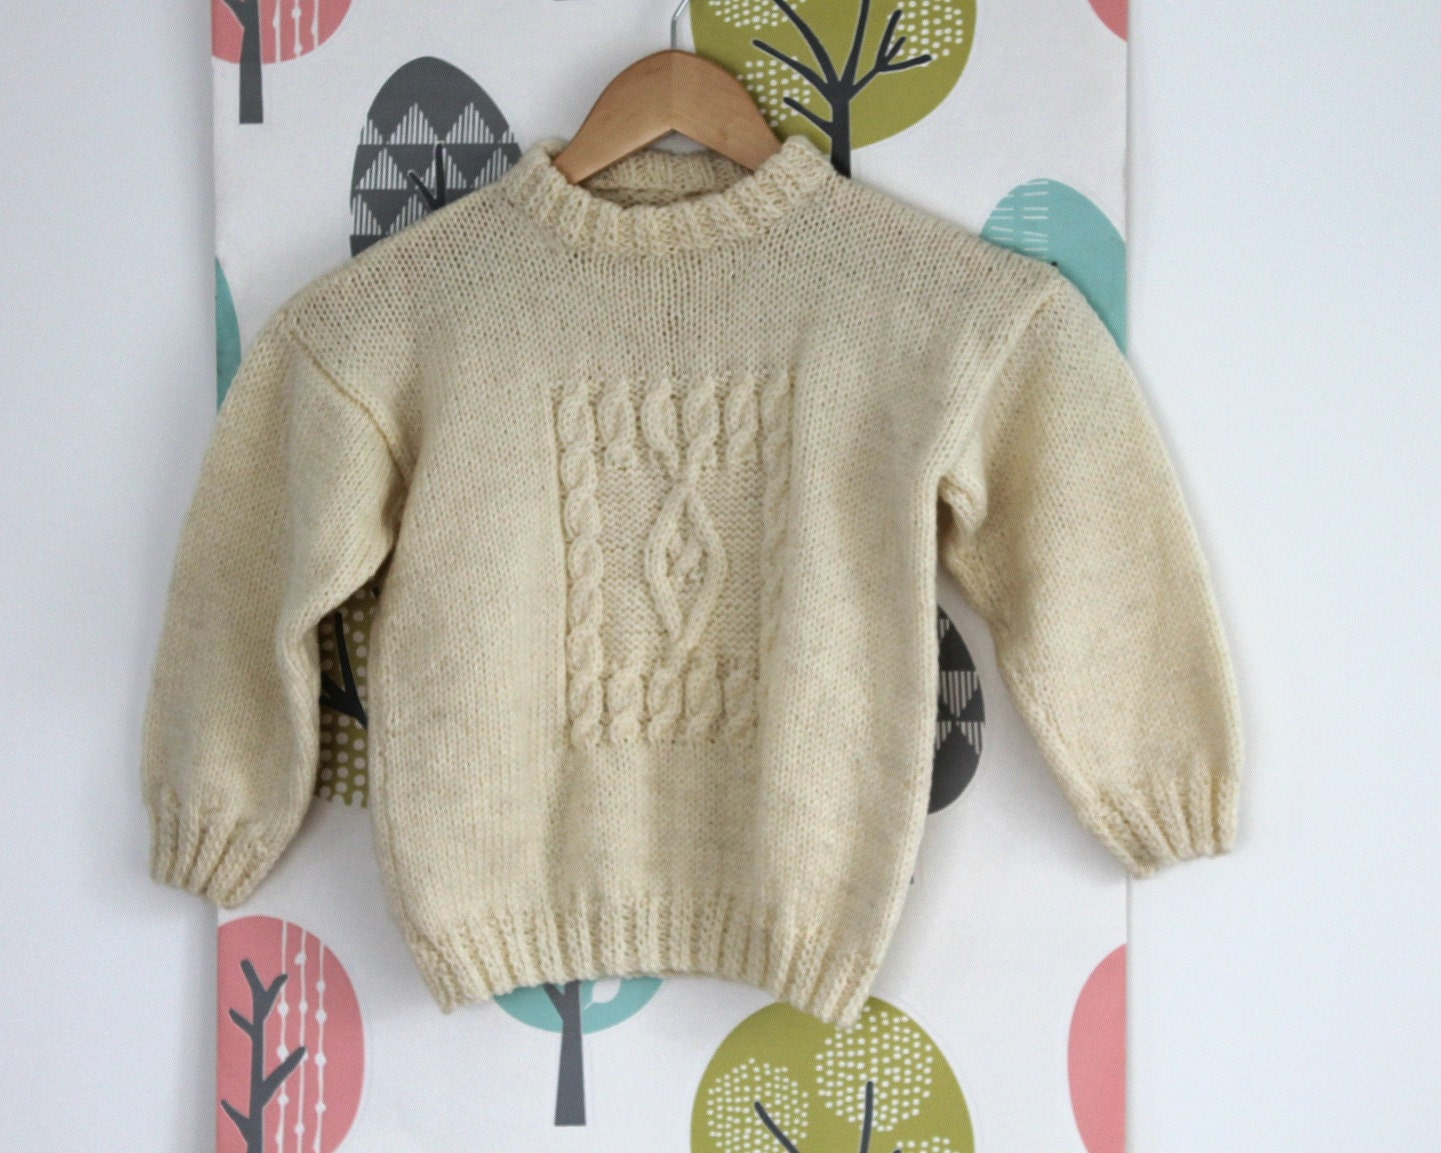 Cable de suéter cardigan de lana tejido a mano de punto suéter | Etsy